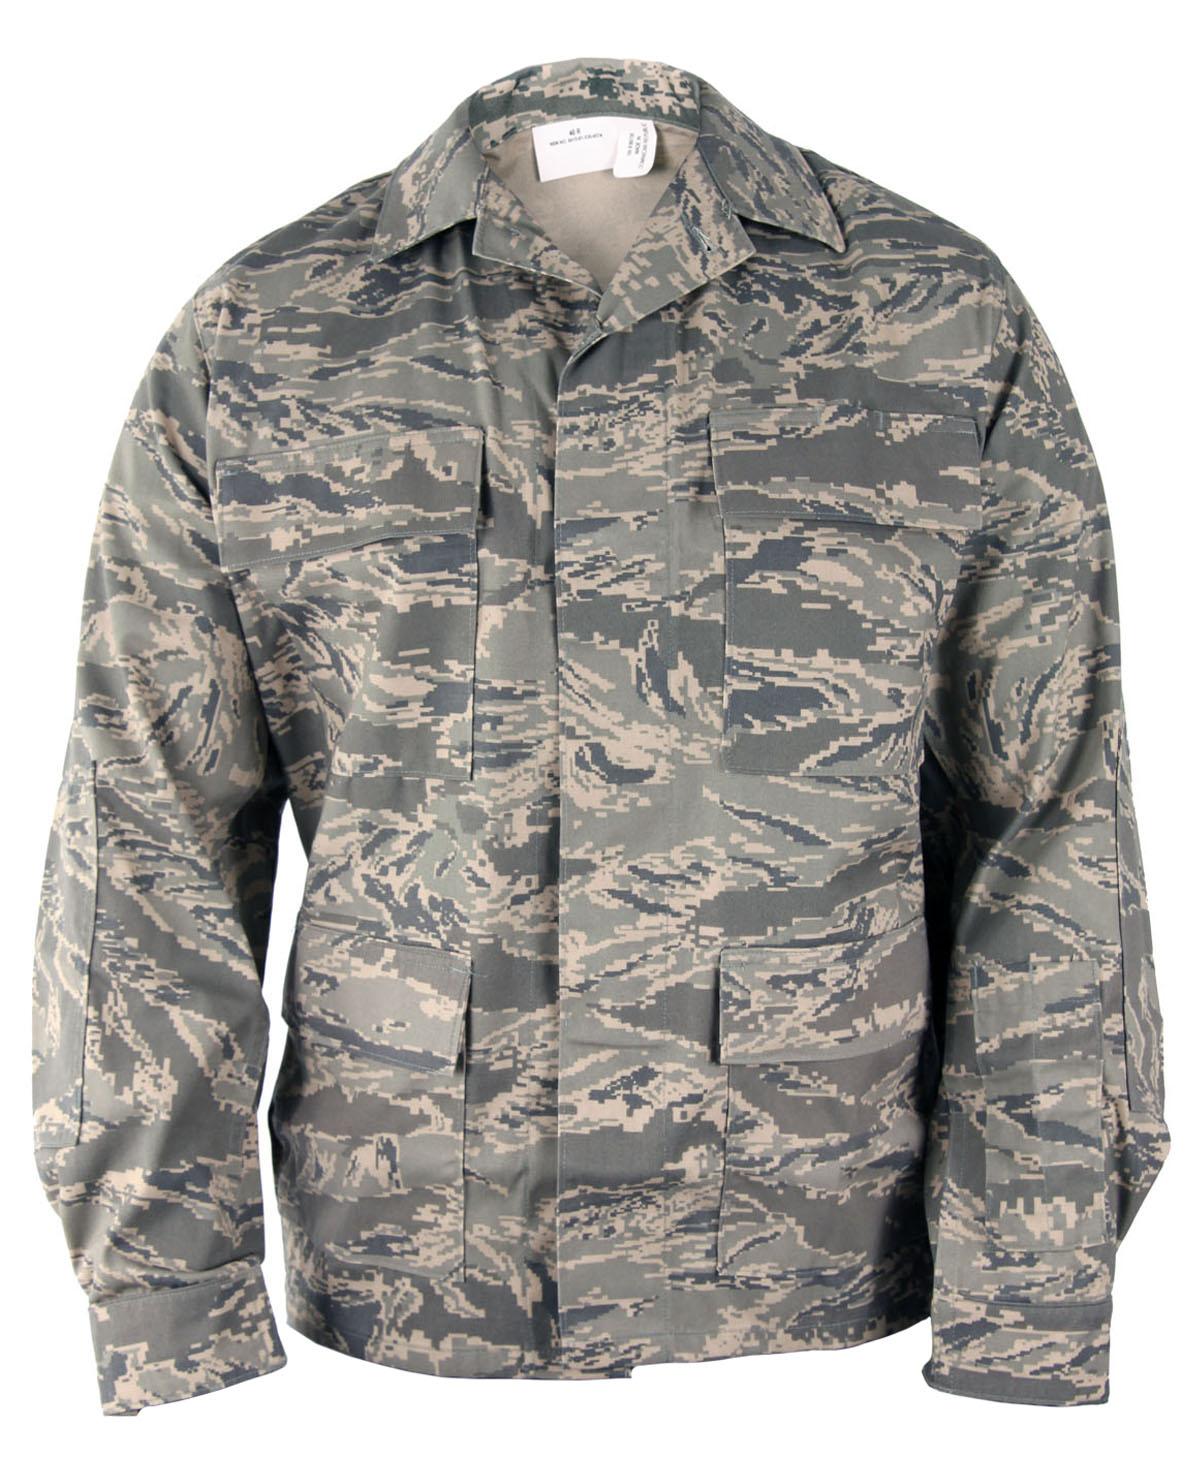 Kellac Uniform 45